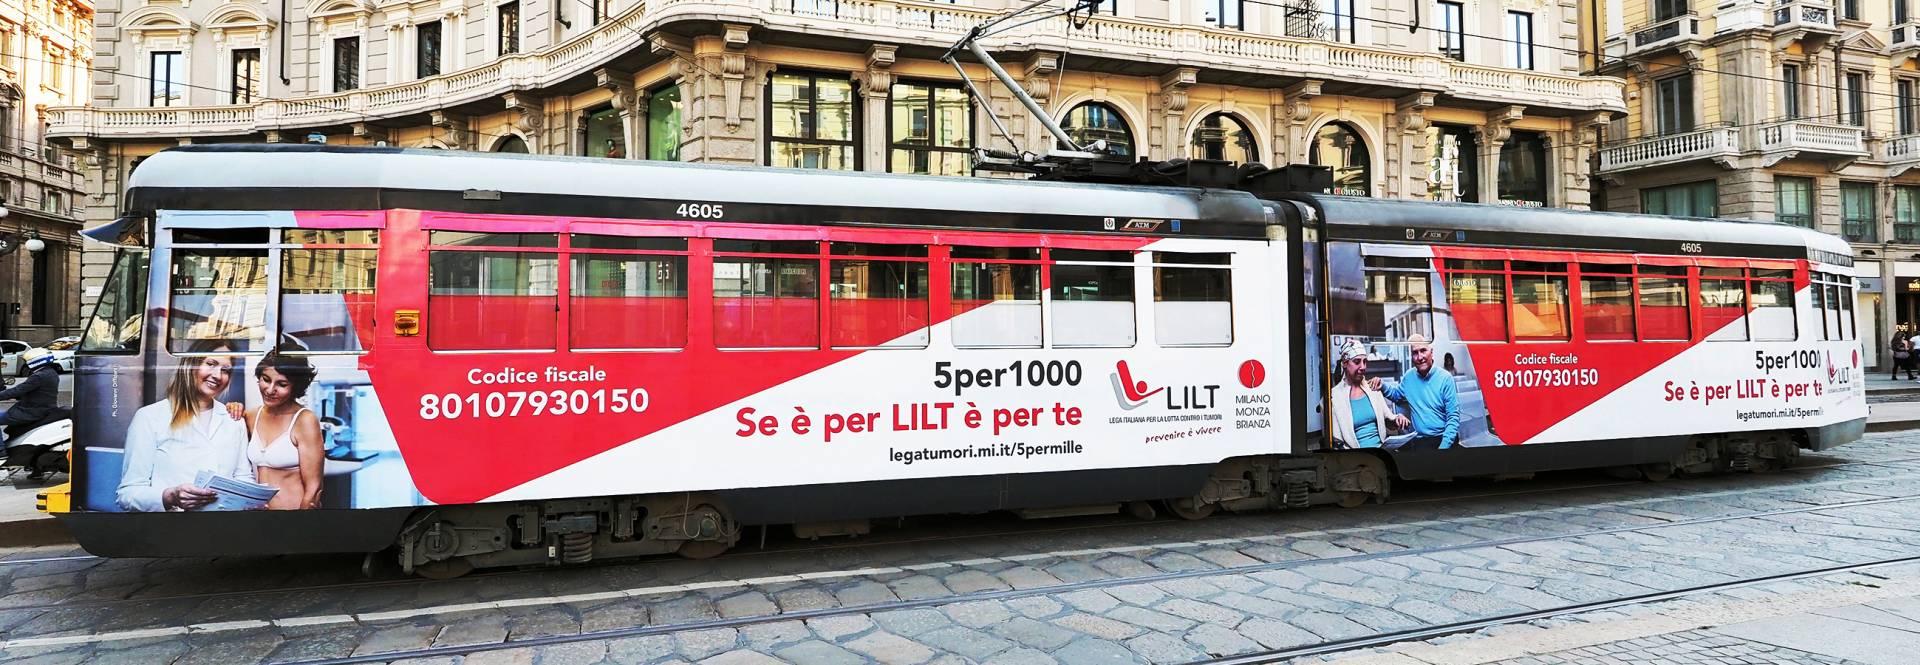 campagna OOH IGPDecaux Milano per LILT